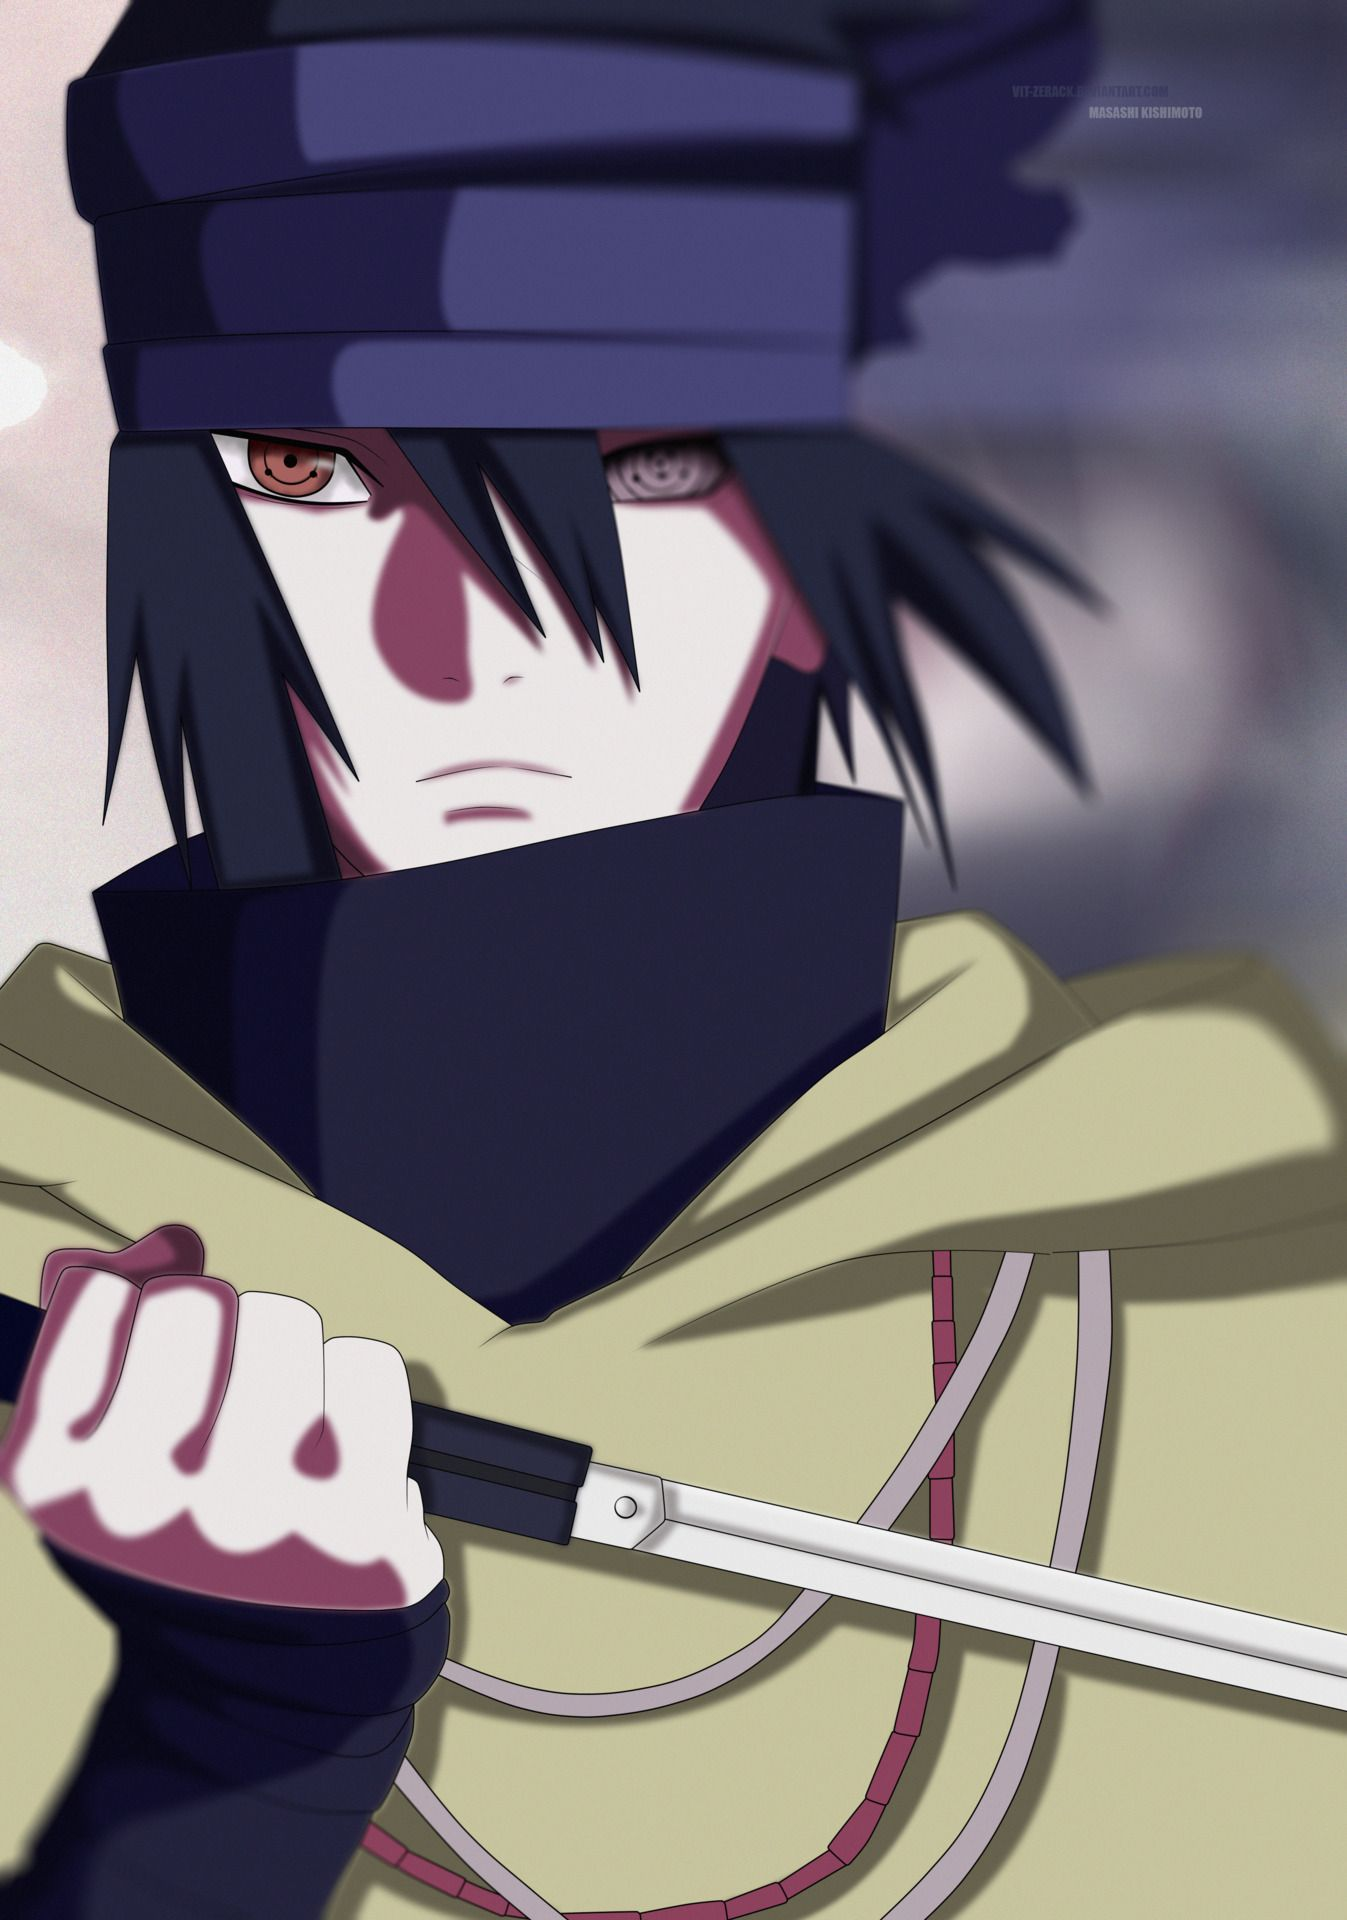 The Last Sasuke Vs Rock Lee Battles Comic Vine Naruto E Sasuke Desenho Naruto Uzumaki Anime Naruto